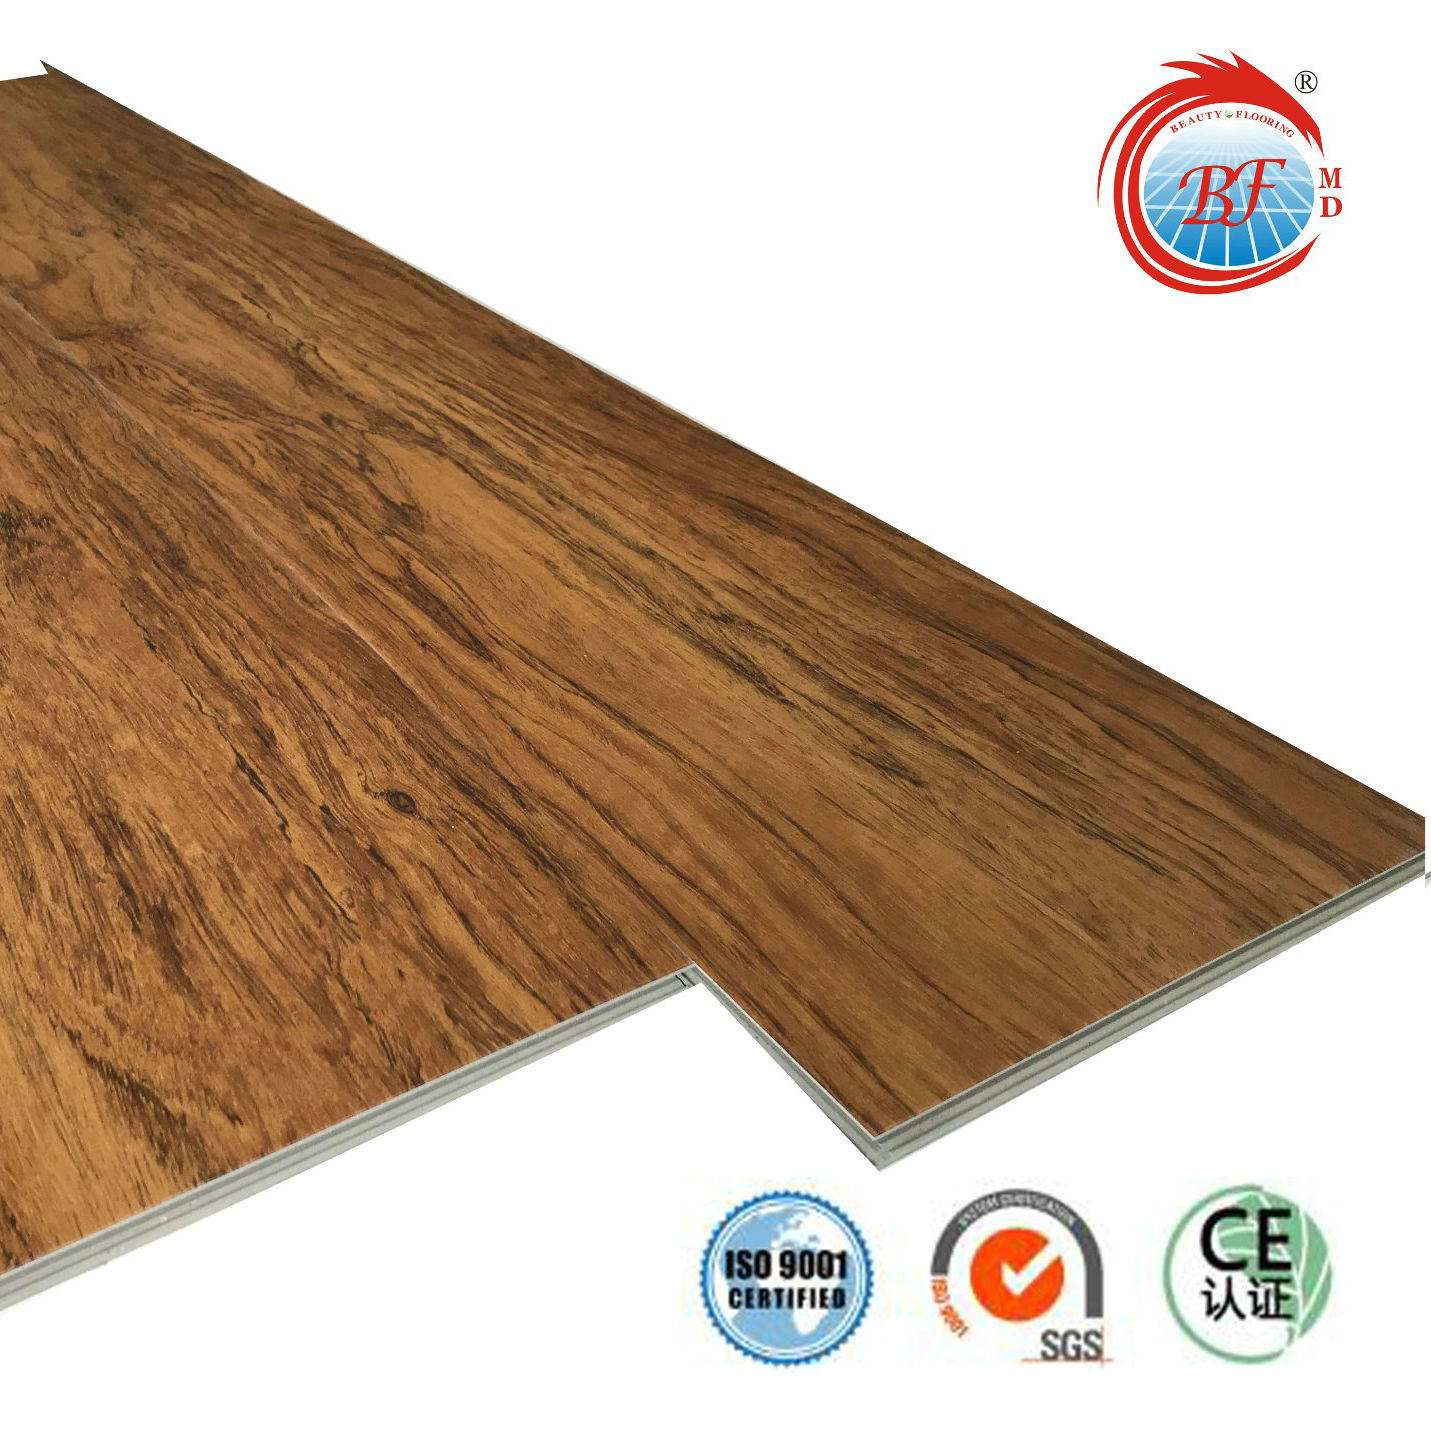 China Oak WearResistant Gray Wood Grain PVC Click Vinyl Flooring - What is lvt flooring made of